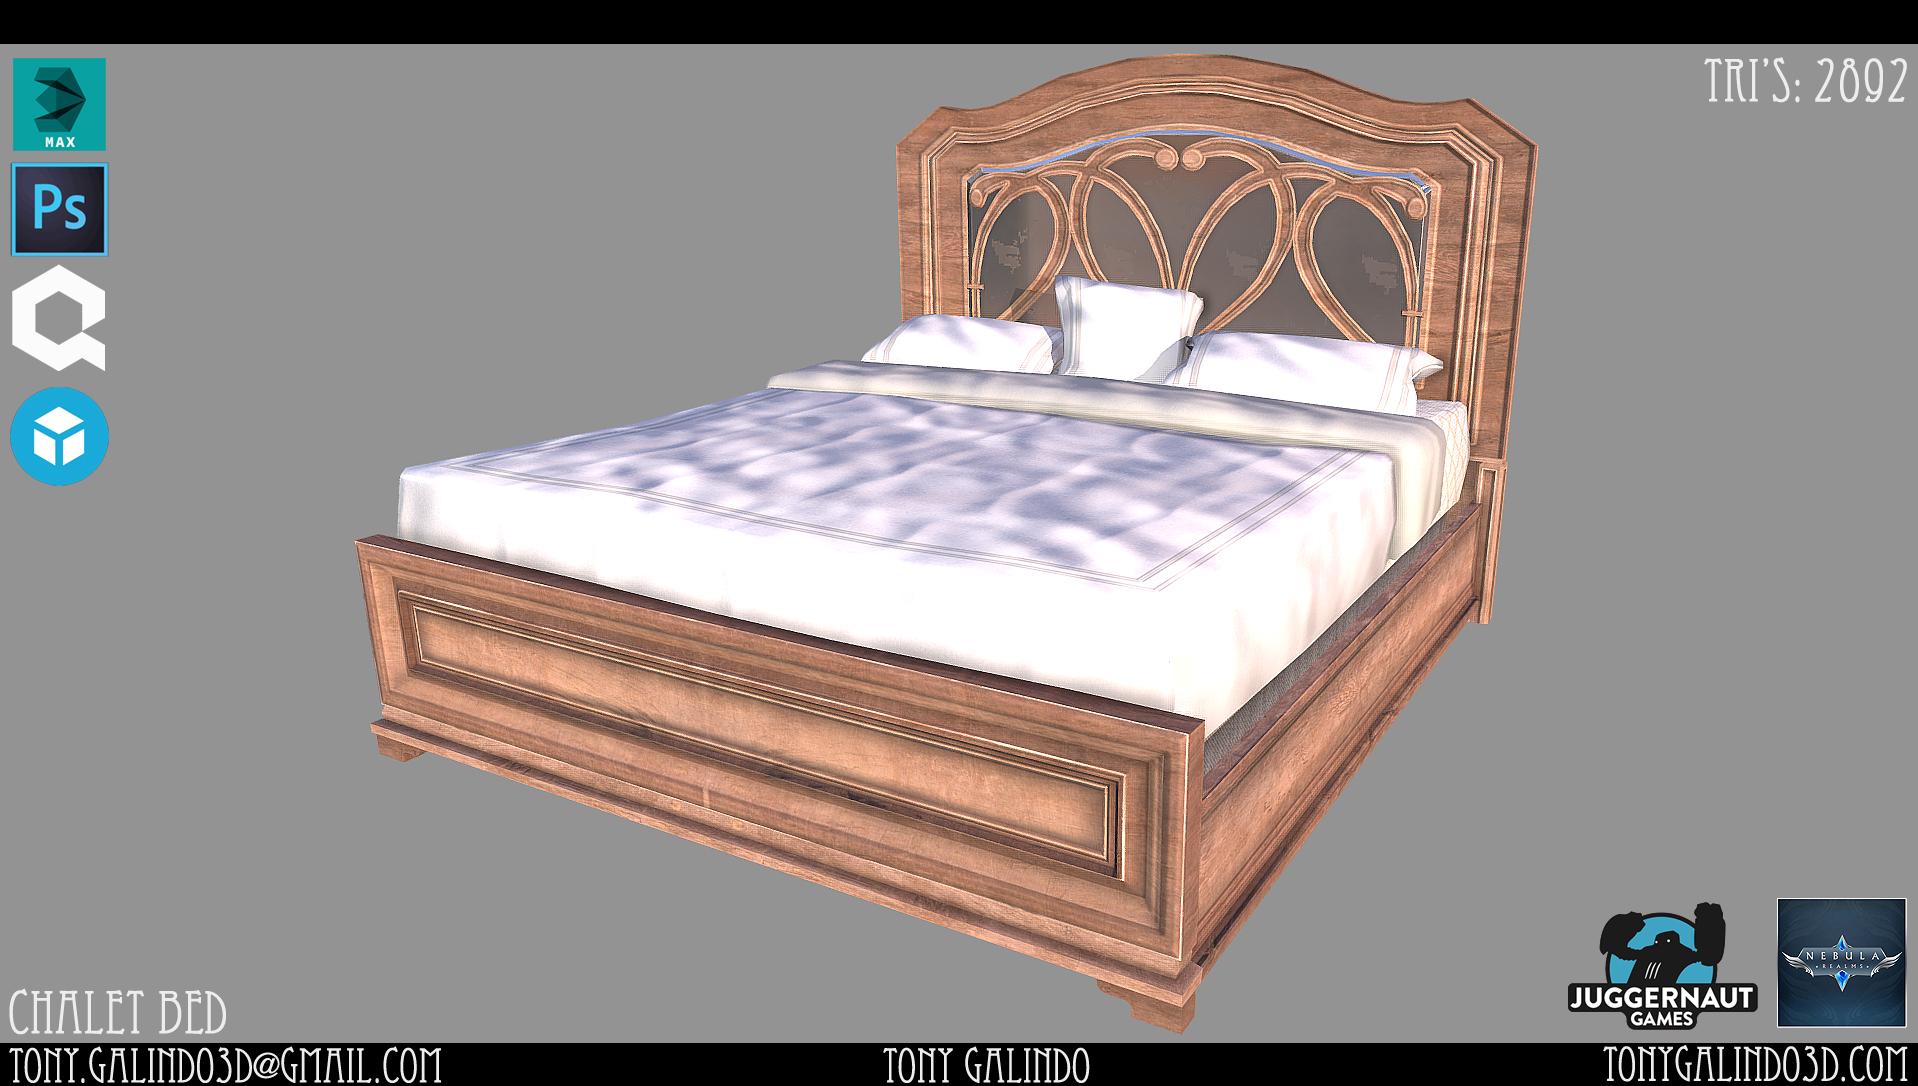 Chalet_Bed.jpg